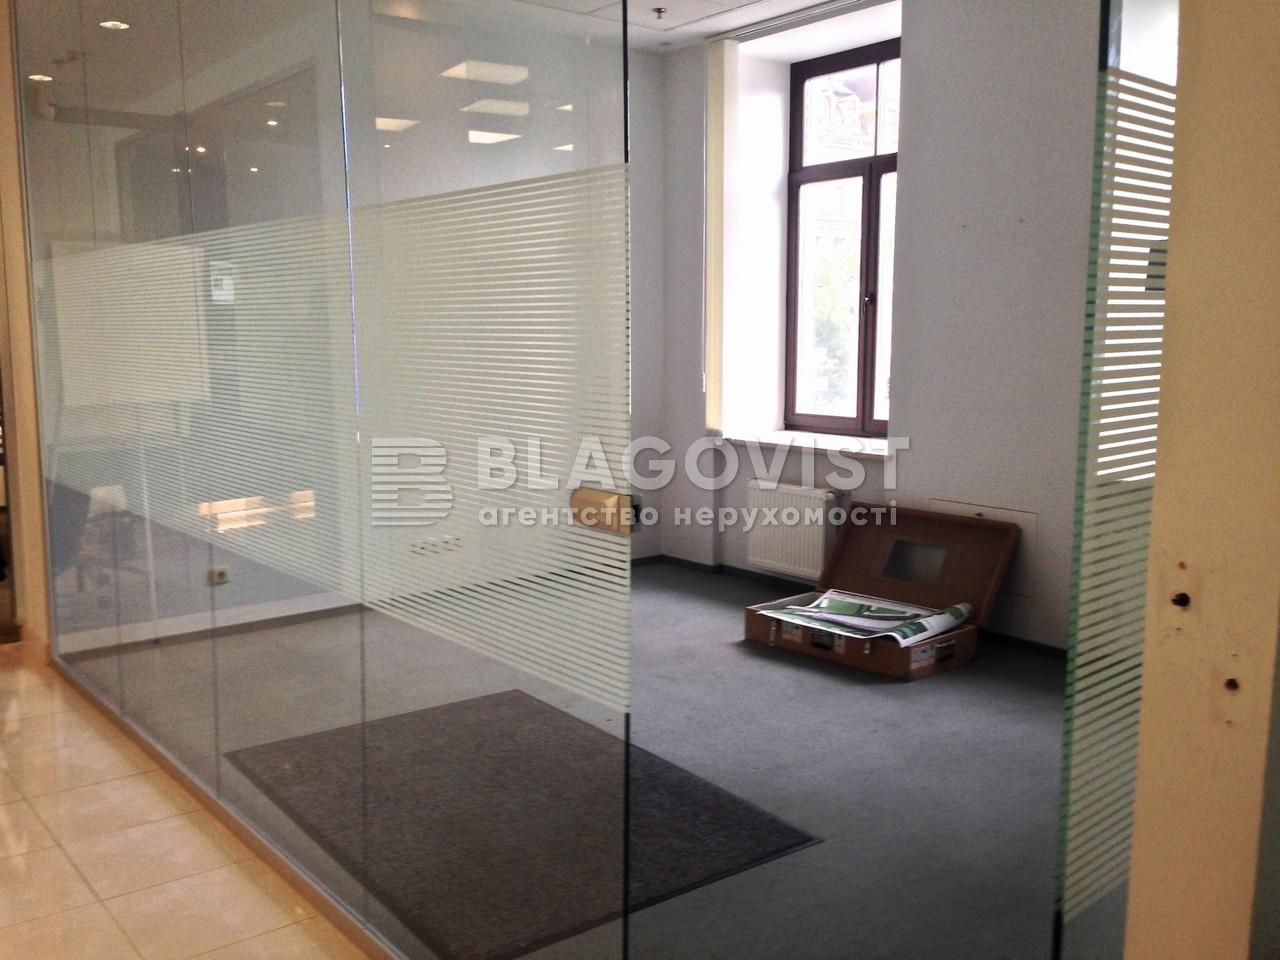 Офис, M-22369, Хмельницкого Богдана, Киев - Фото 5